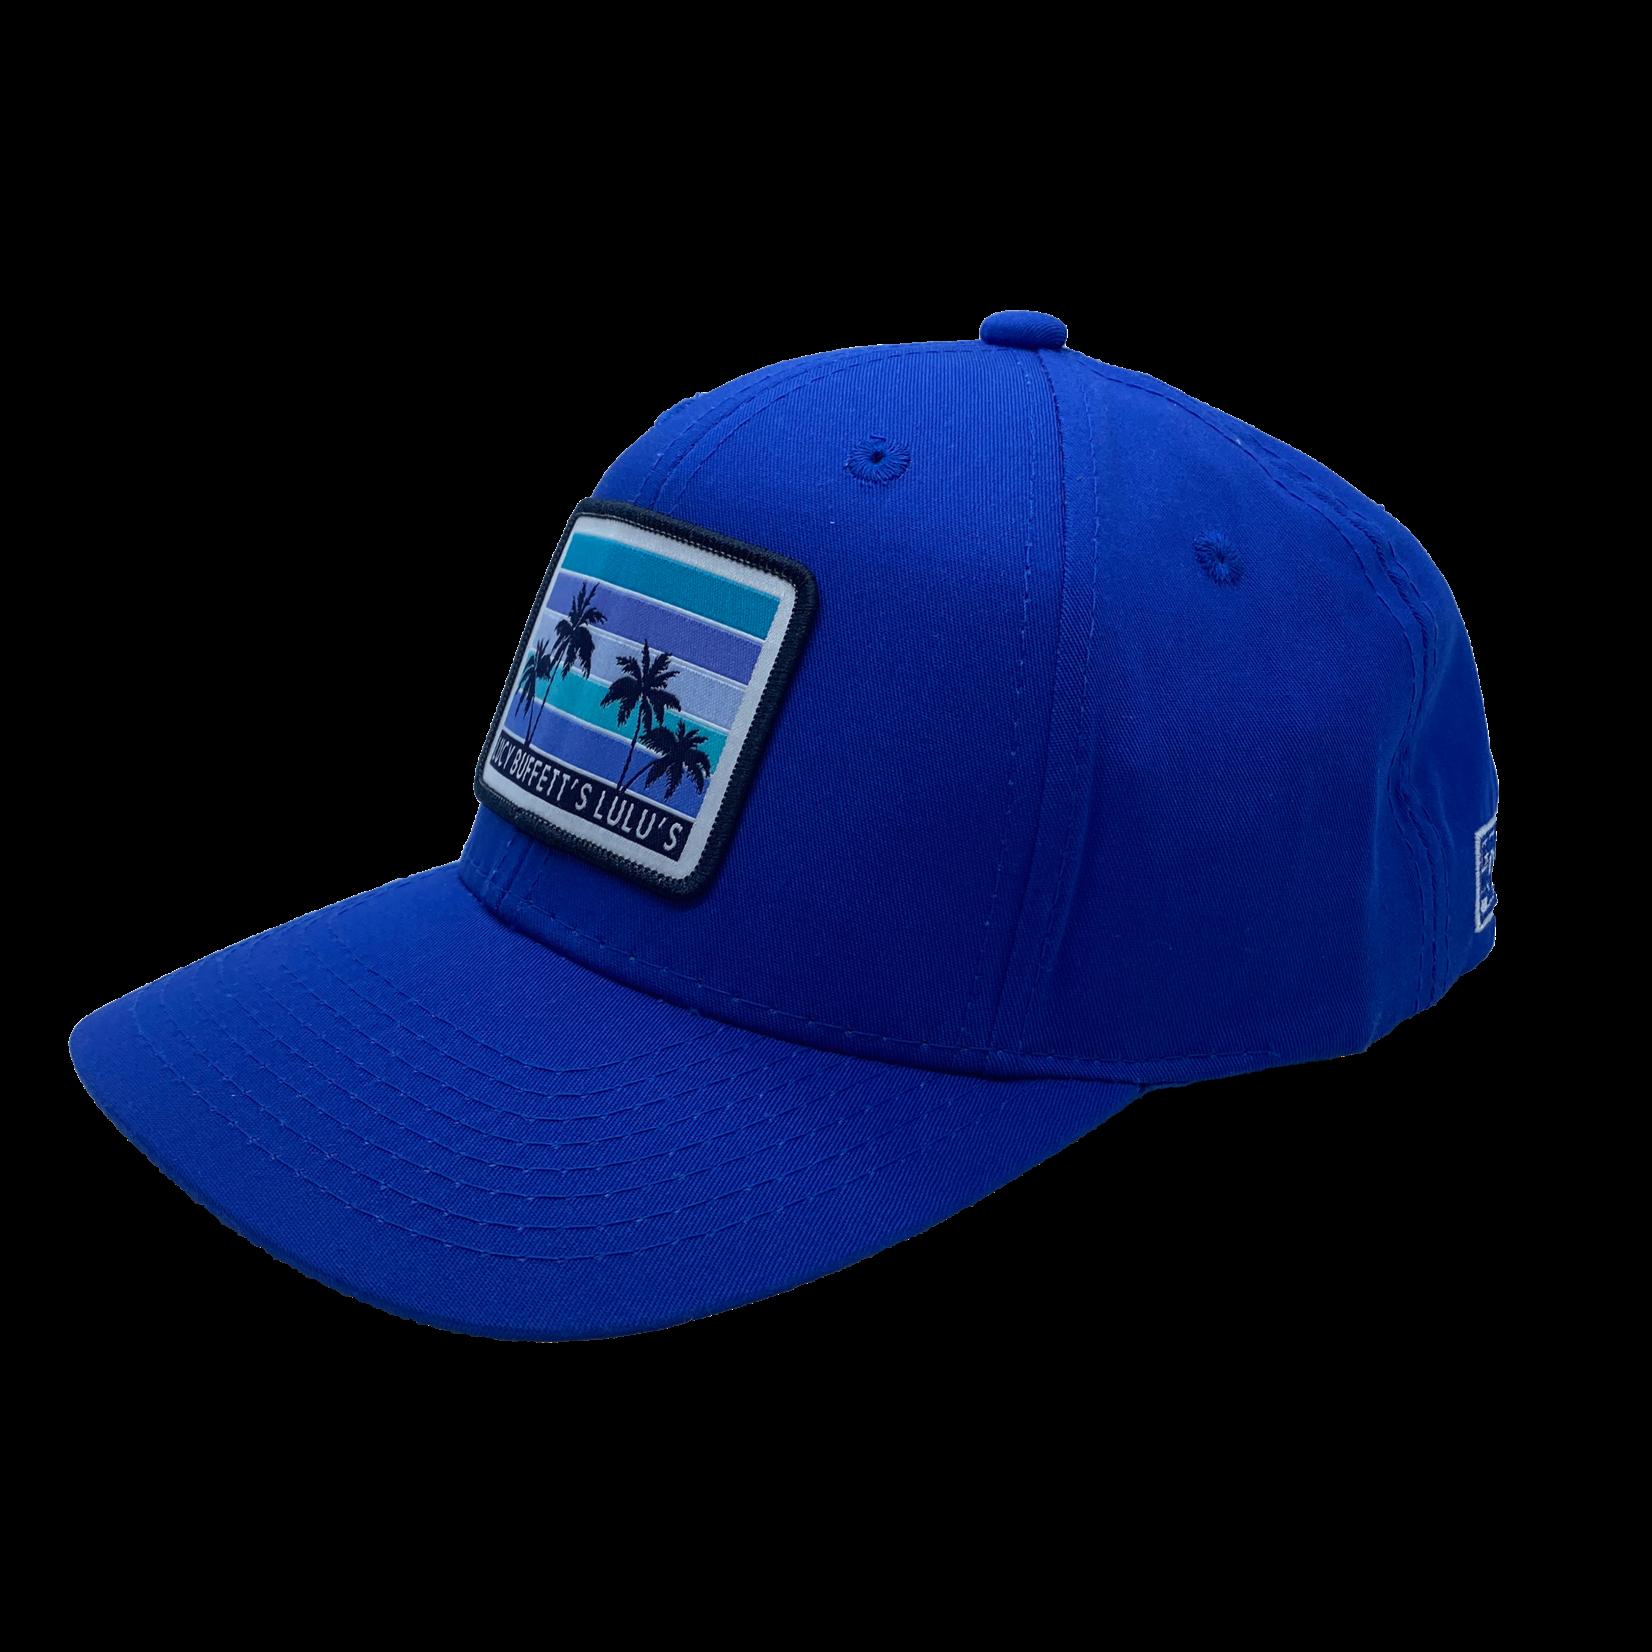 LuLus Palm Hat